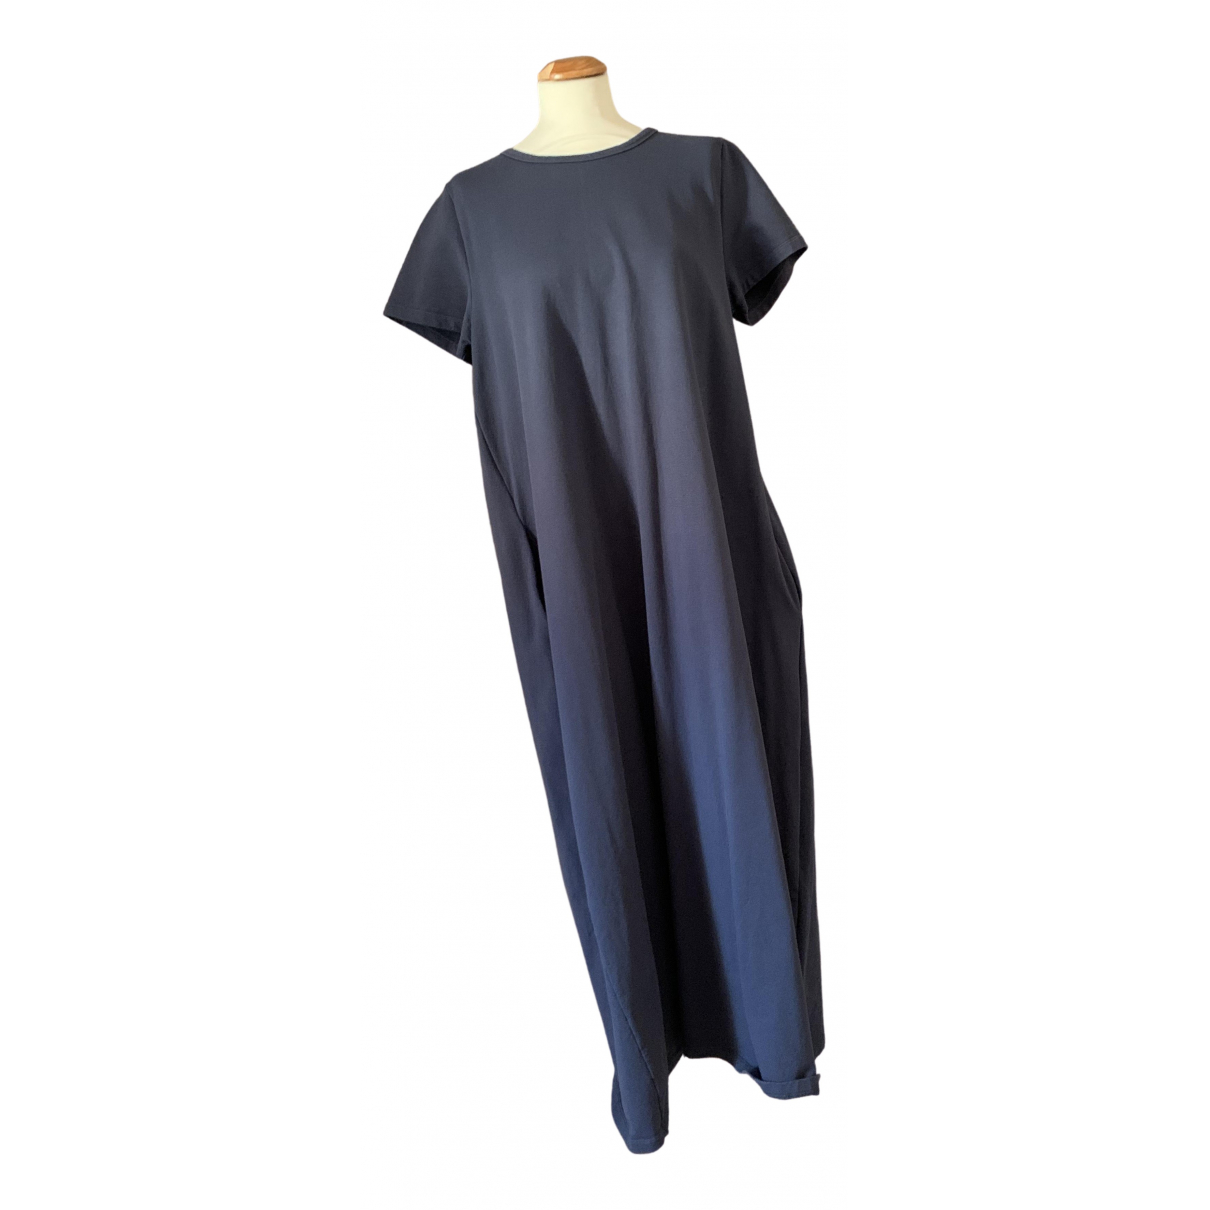 Cos \N Blue Cotton dress for Women L International